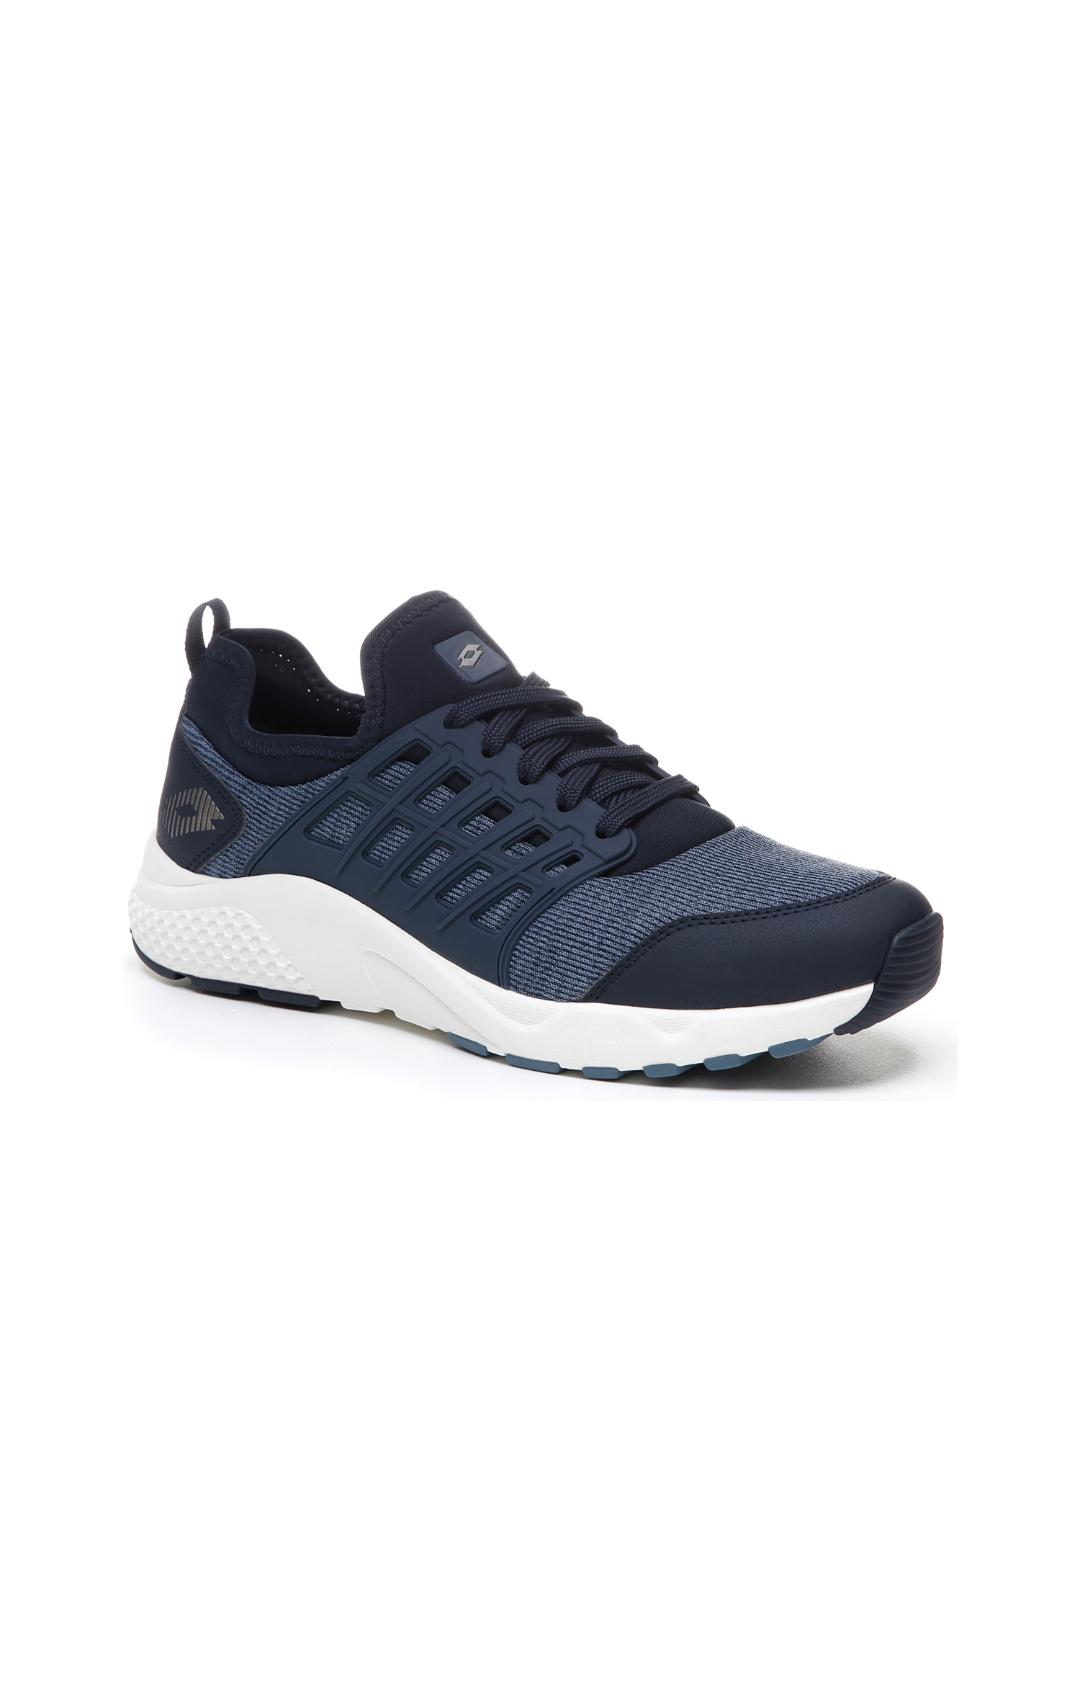 Lotto   Lotto Men's Breeze Free Iv Mlg Dark Blue/Gravity Titan/Blue Mirage Running Shoes